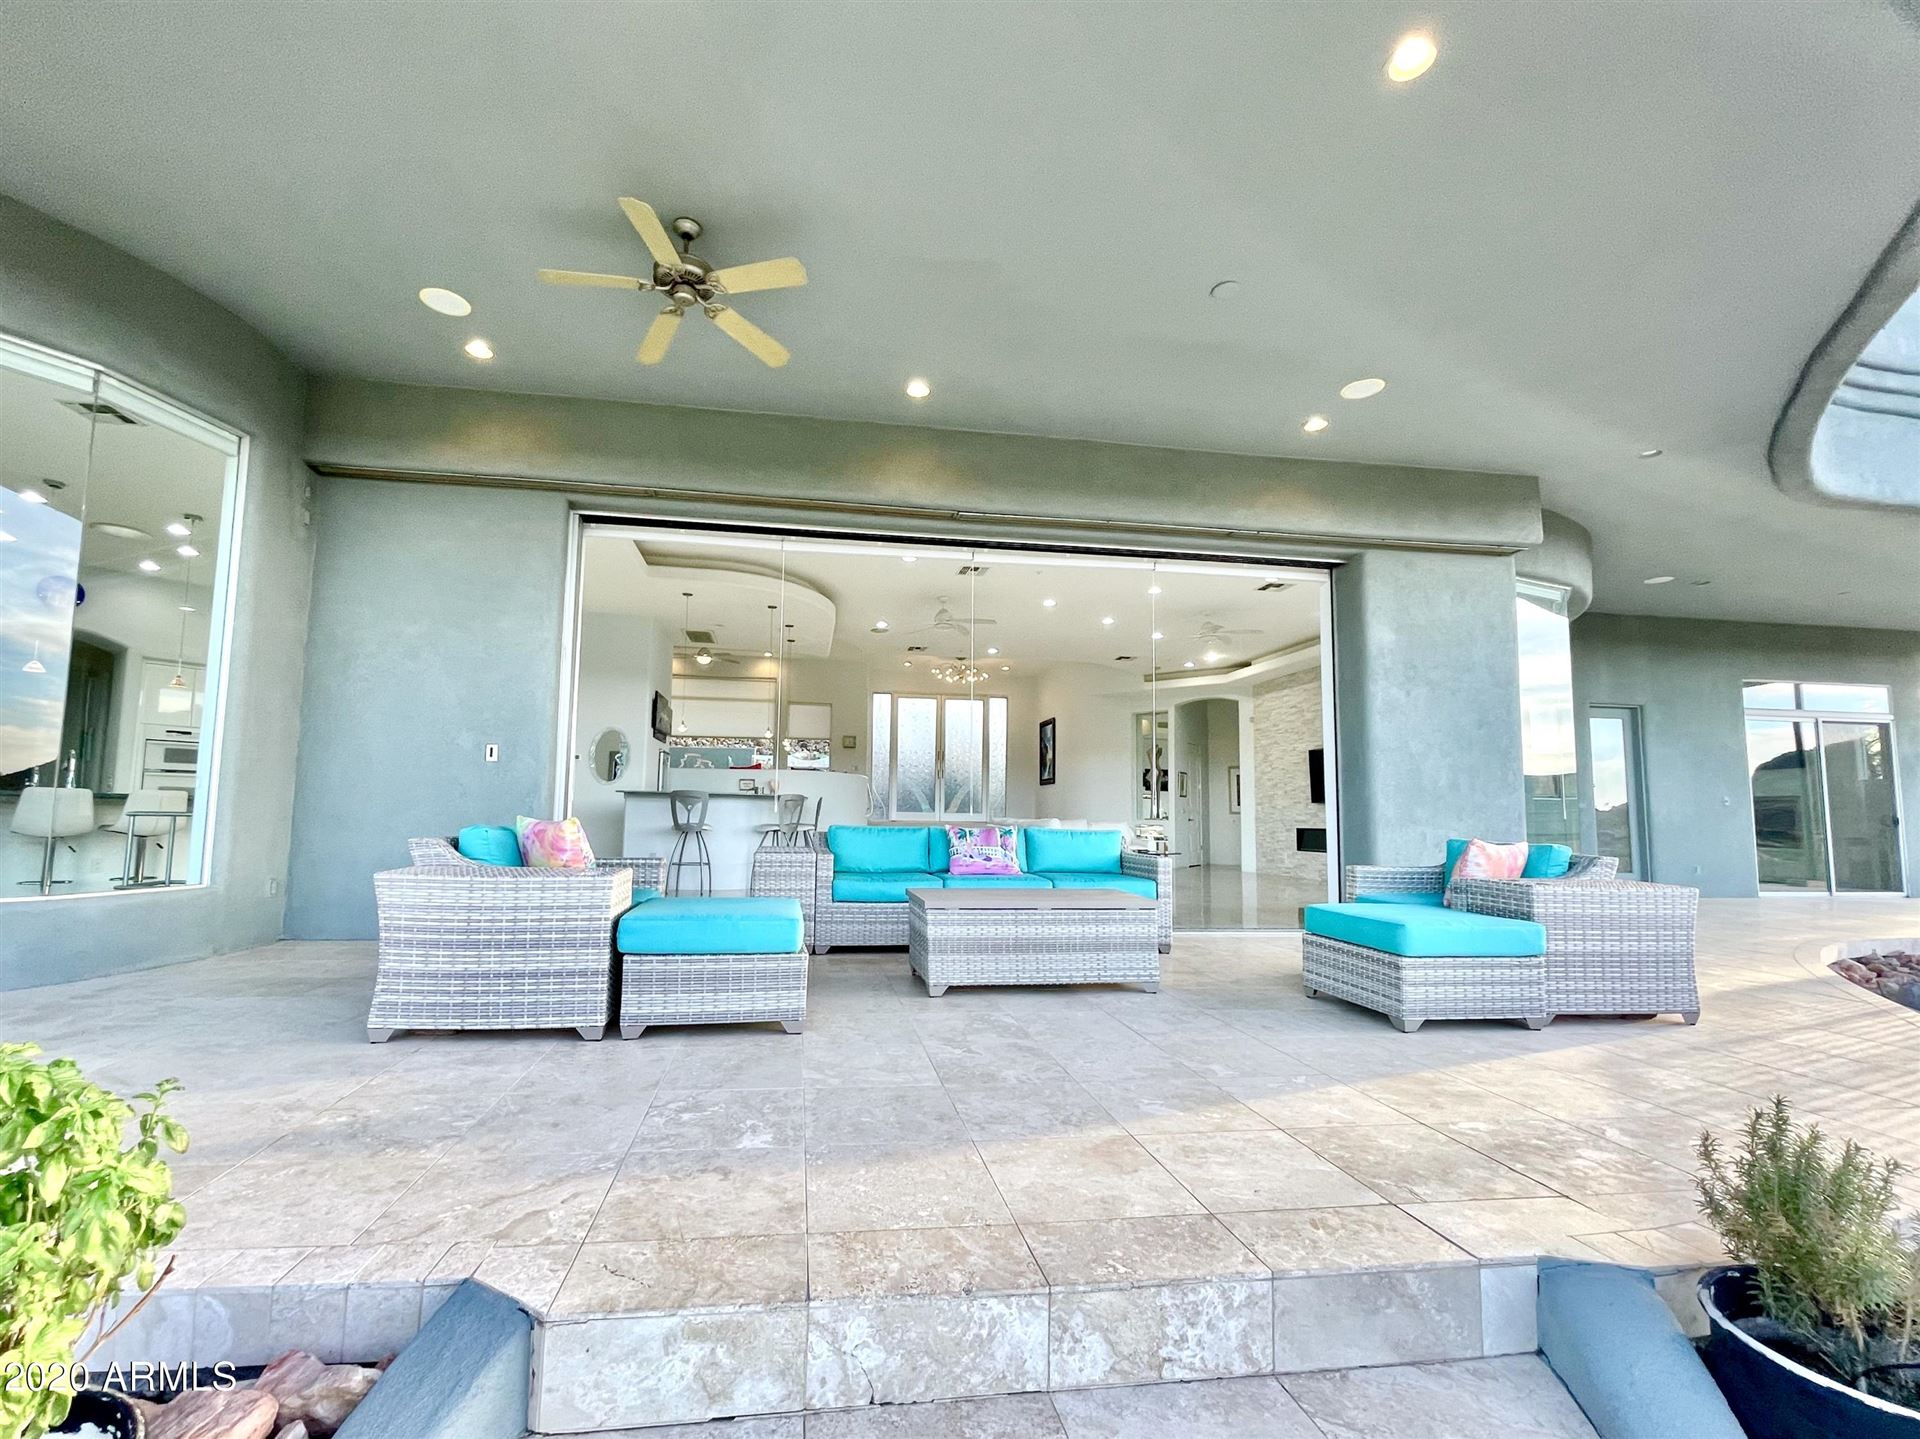 15054 E MIRAVISTA --, Fountain Hills, AZ 85268 - MLS#: 6098522